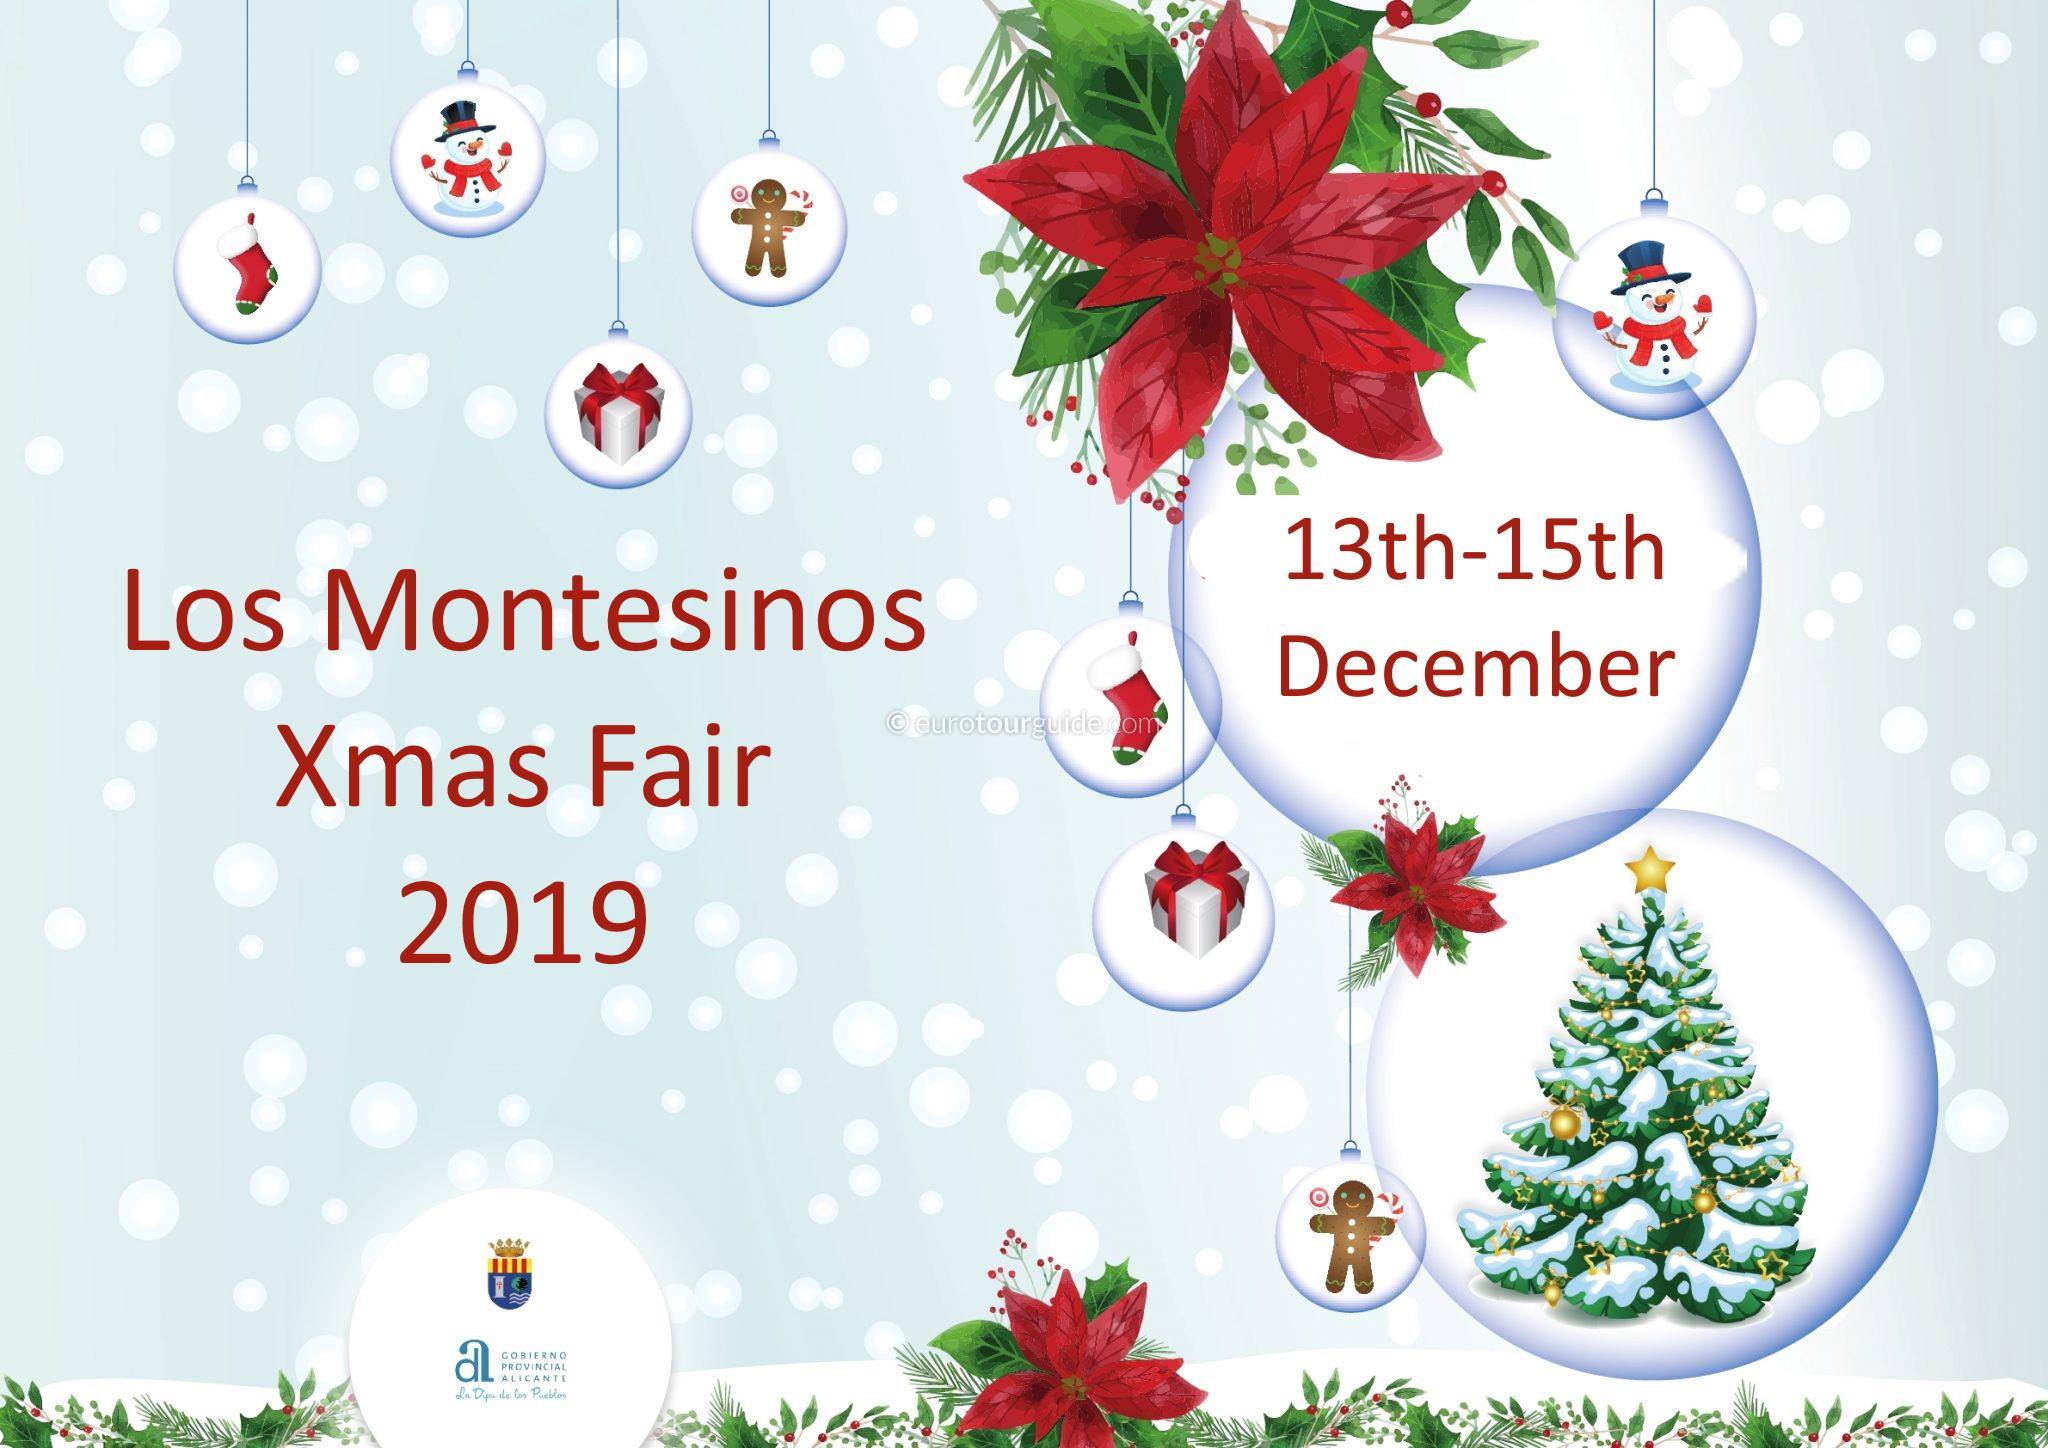 Los Montesinos 9th Christmas Market 13th-15th December 2019